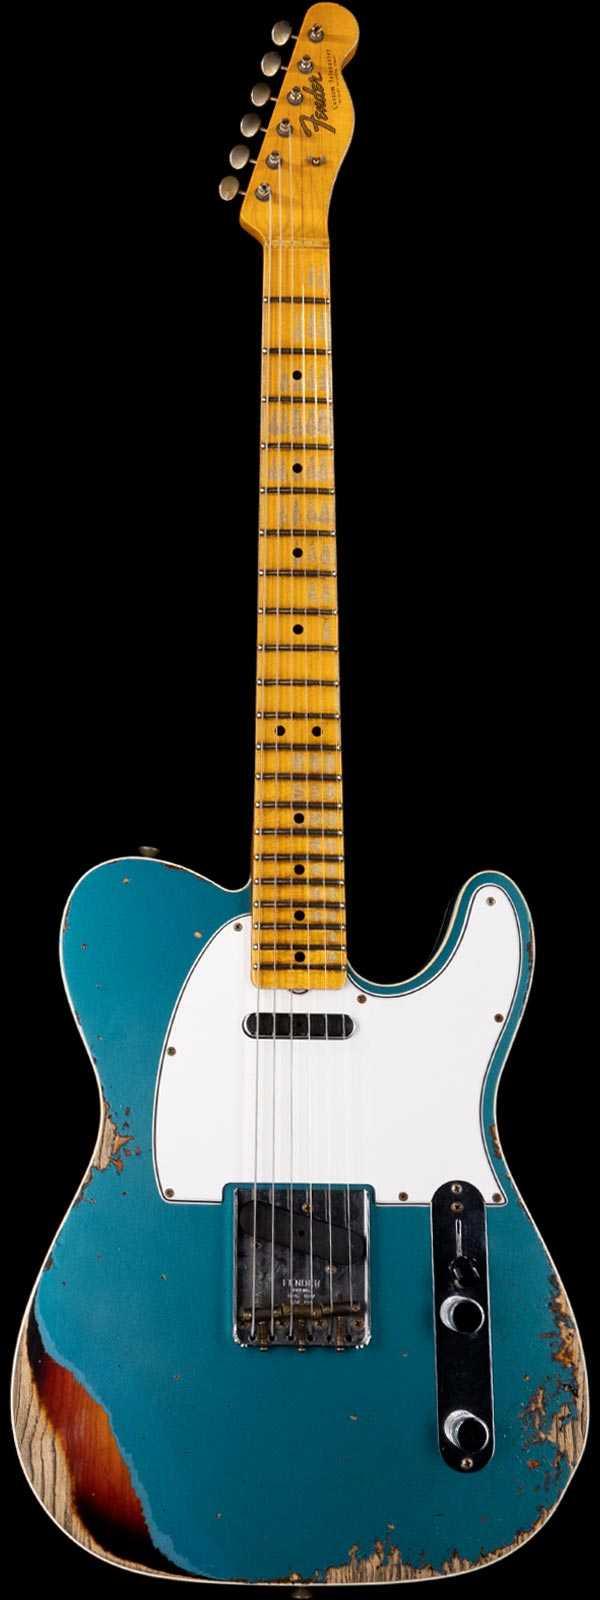 Fender Custom Shop Limited 1965 Telecaster Heavy Relic Aged Ocean Turquoise over 3-Tone Sunburst